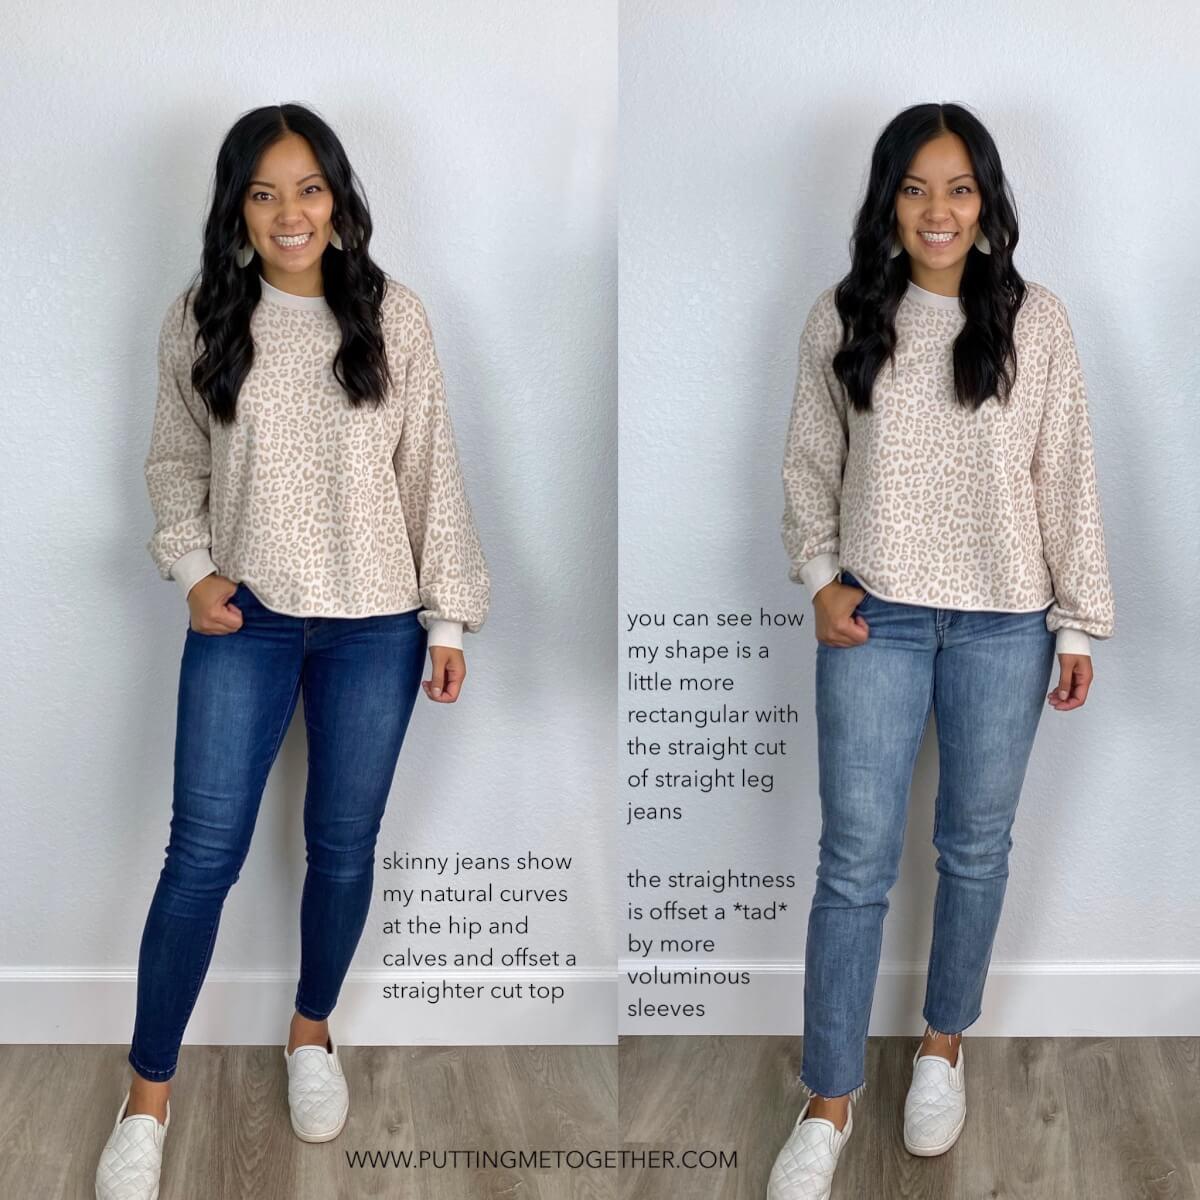 Skinny Jeans vs. Straight Leg Jeans: pale pink leopard sweatshirt, medium blue skinny jeans, light wash straight leg jeans, white slip-on sneakers, white earrings